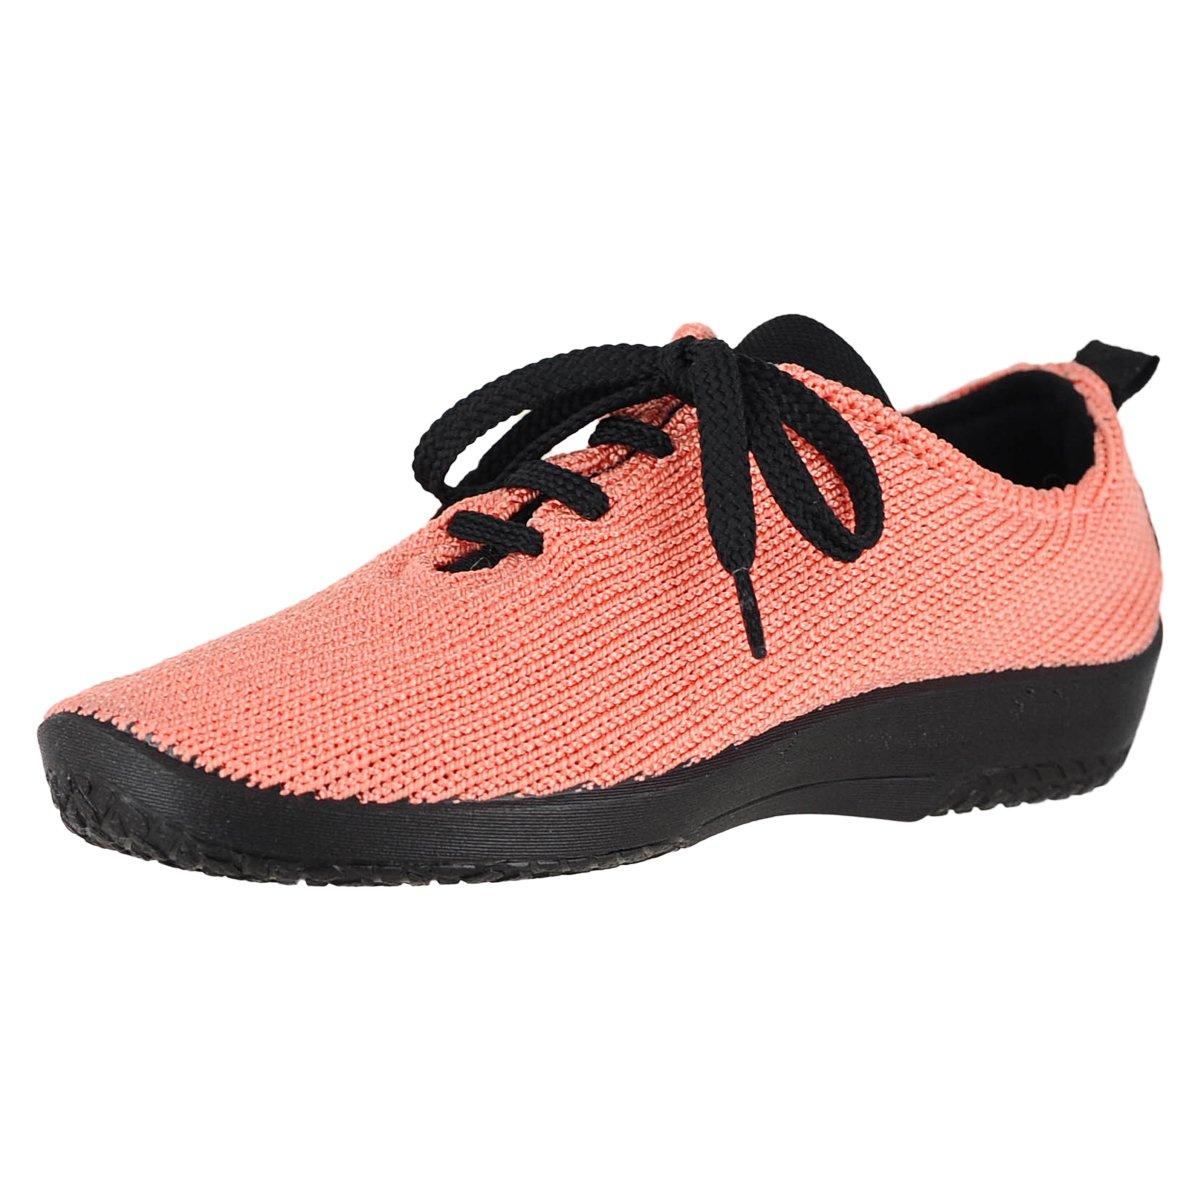 Arcopedico Womens LS Tie Knit Salmon Oxford - 39